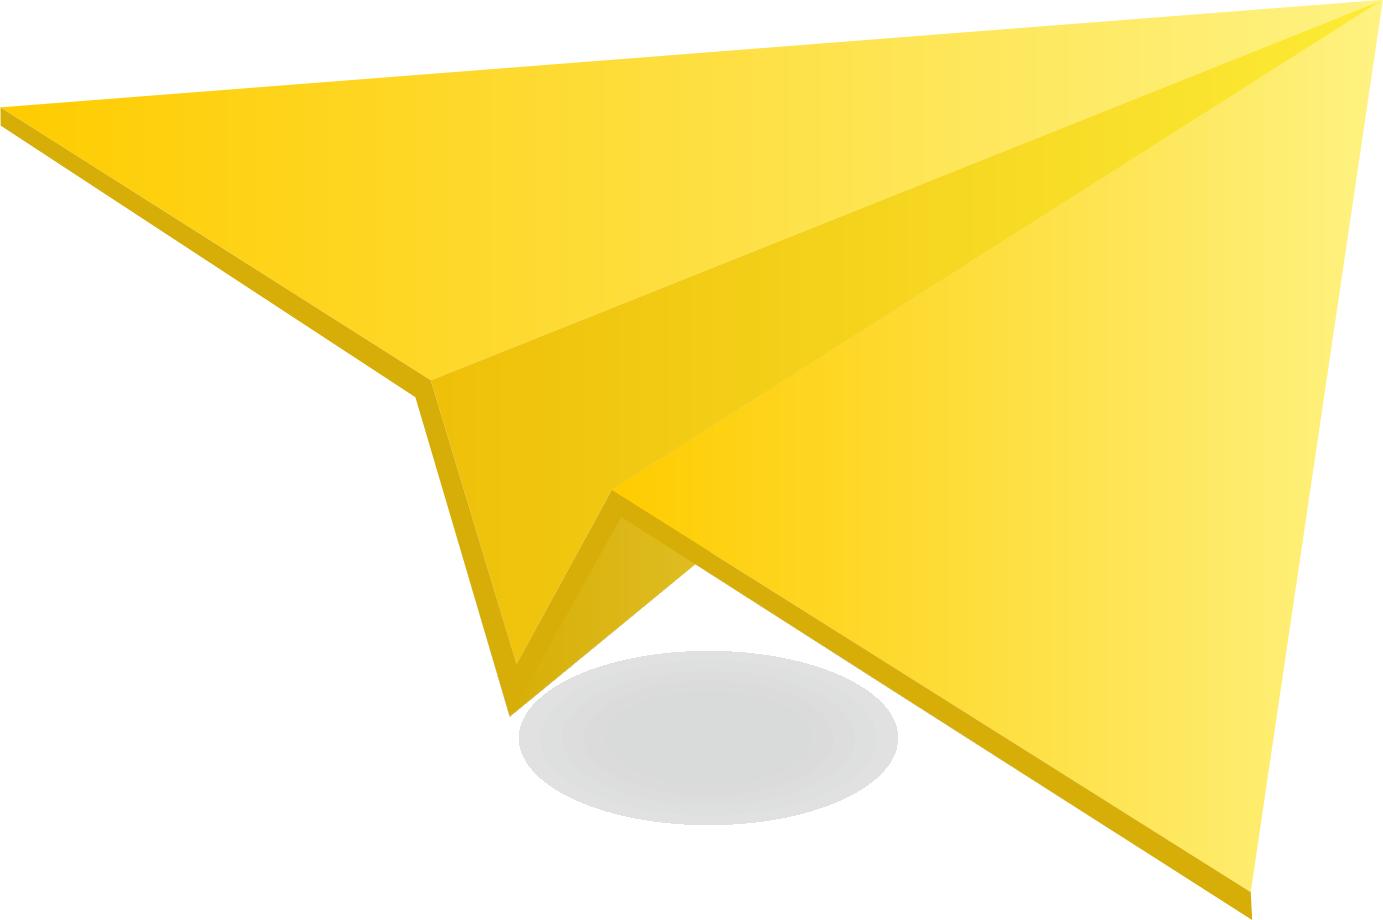 Yellow  Paper Plane